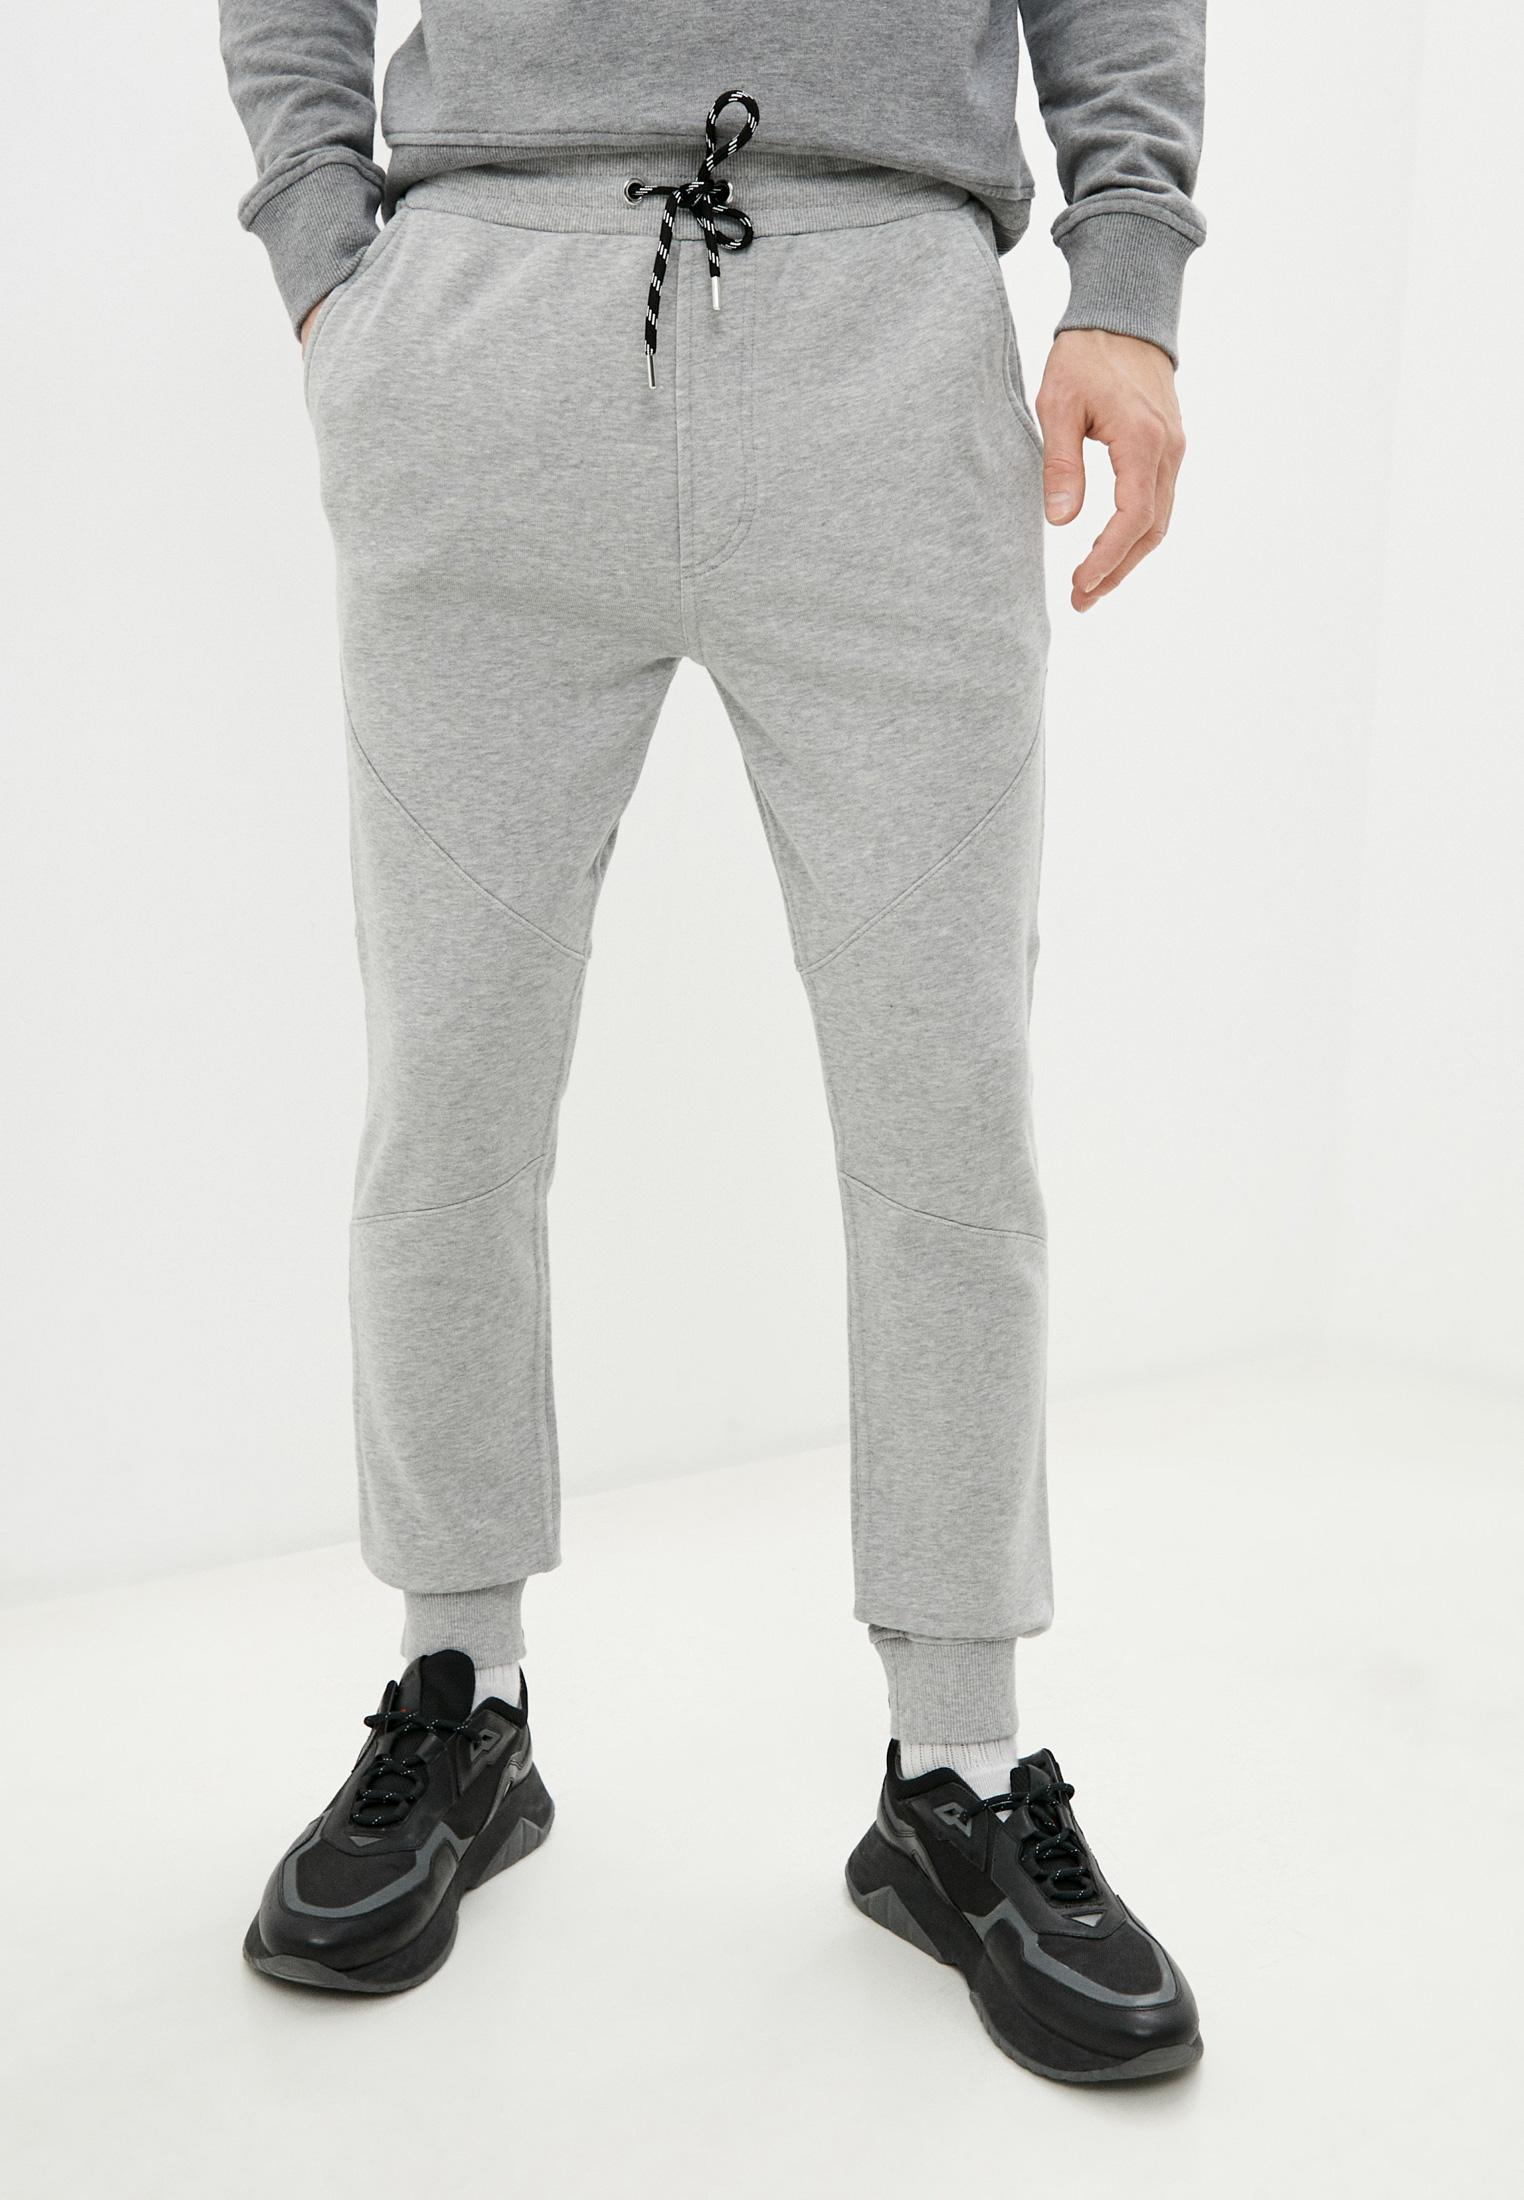 Мужские спортивные брюки Just Cavalli (Джаст Кавалли) S01KA0189N25189